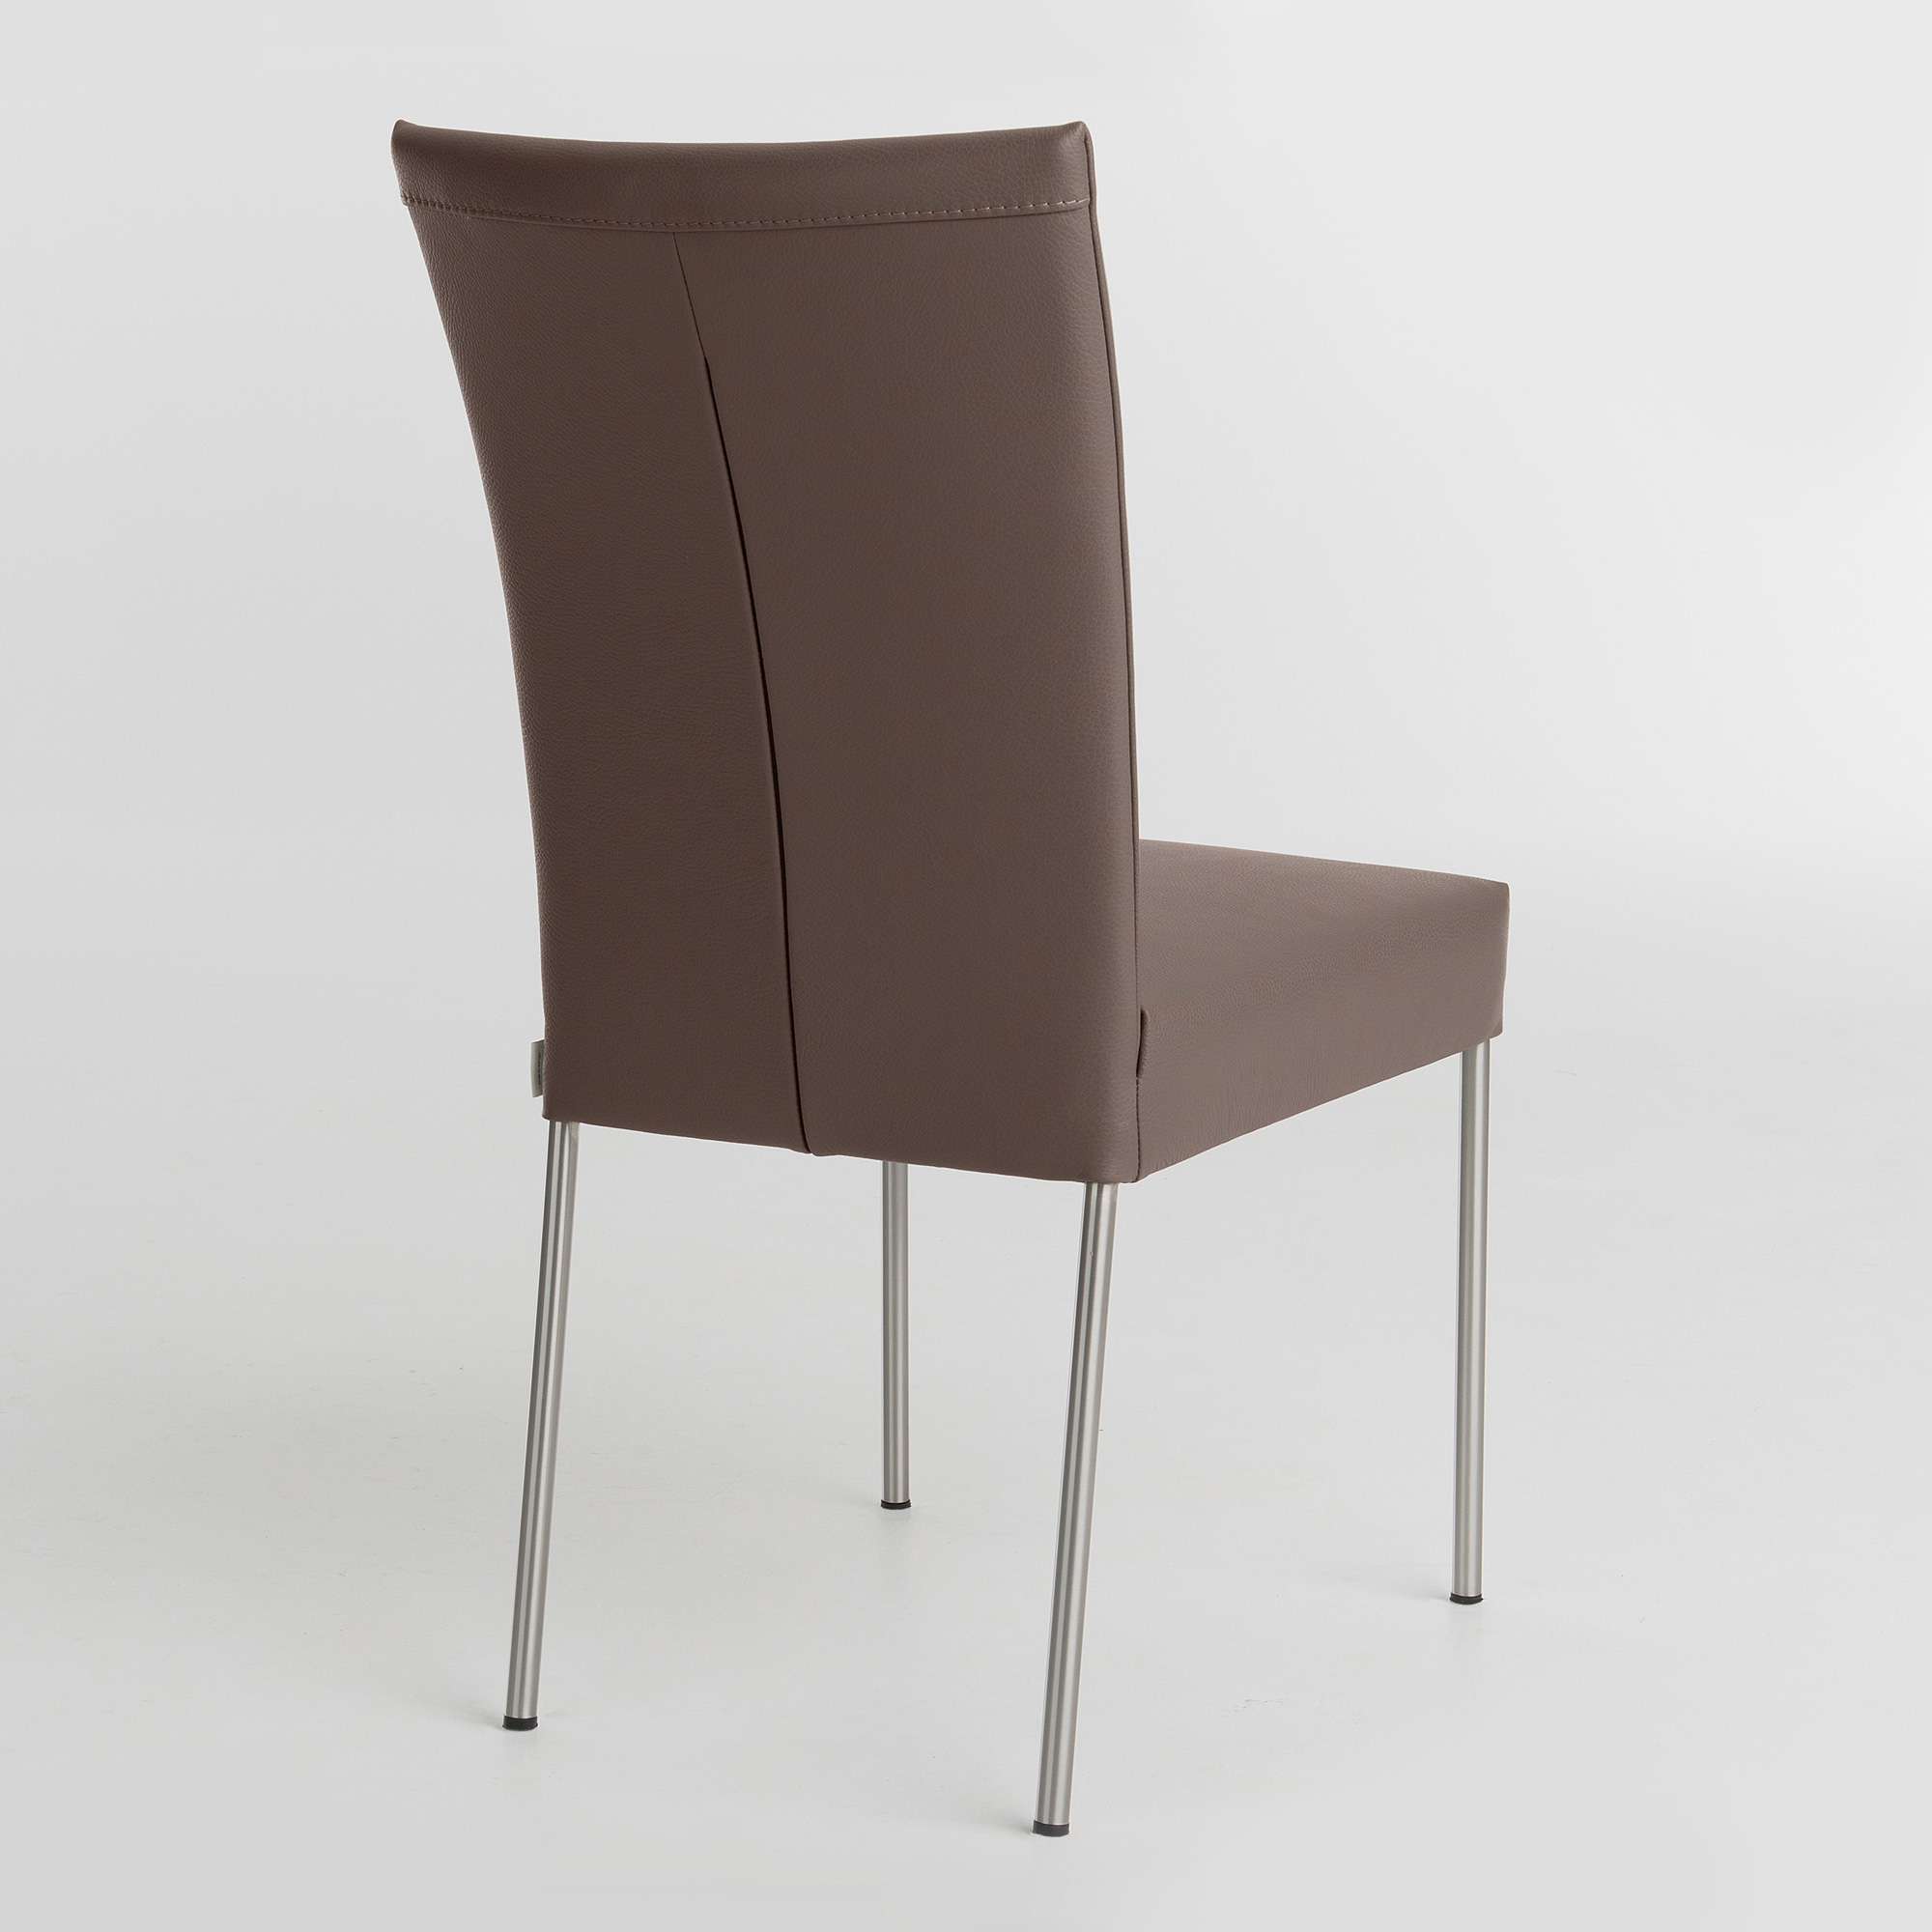 bert plantagie felp stuhl felp ld0511 beinerund reuter onlineshop. Black Bedroom Furniture Sets. Home Design Ideas